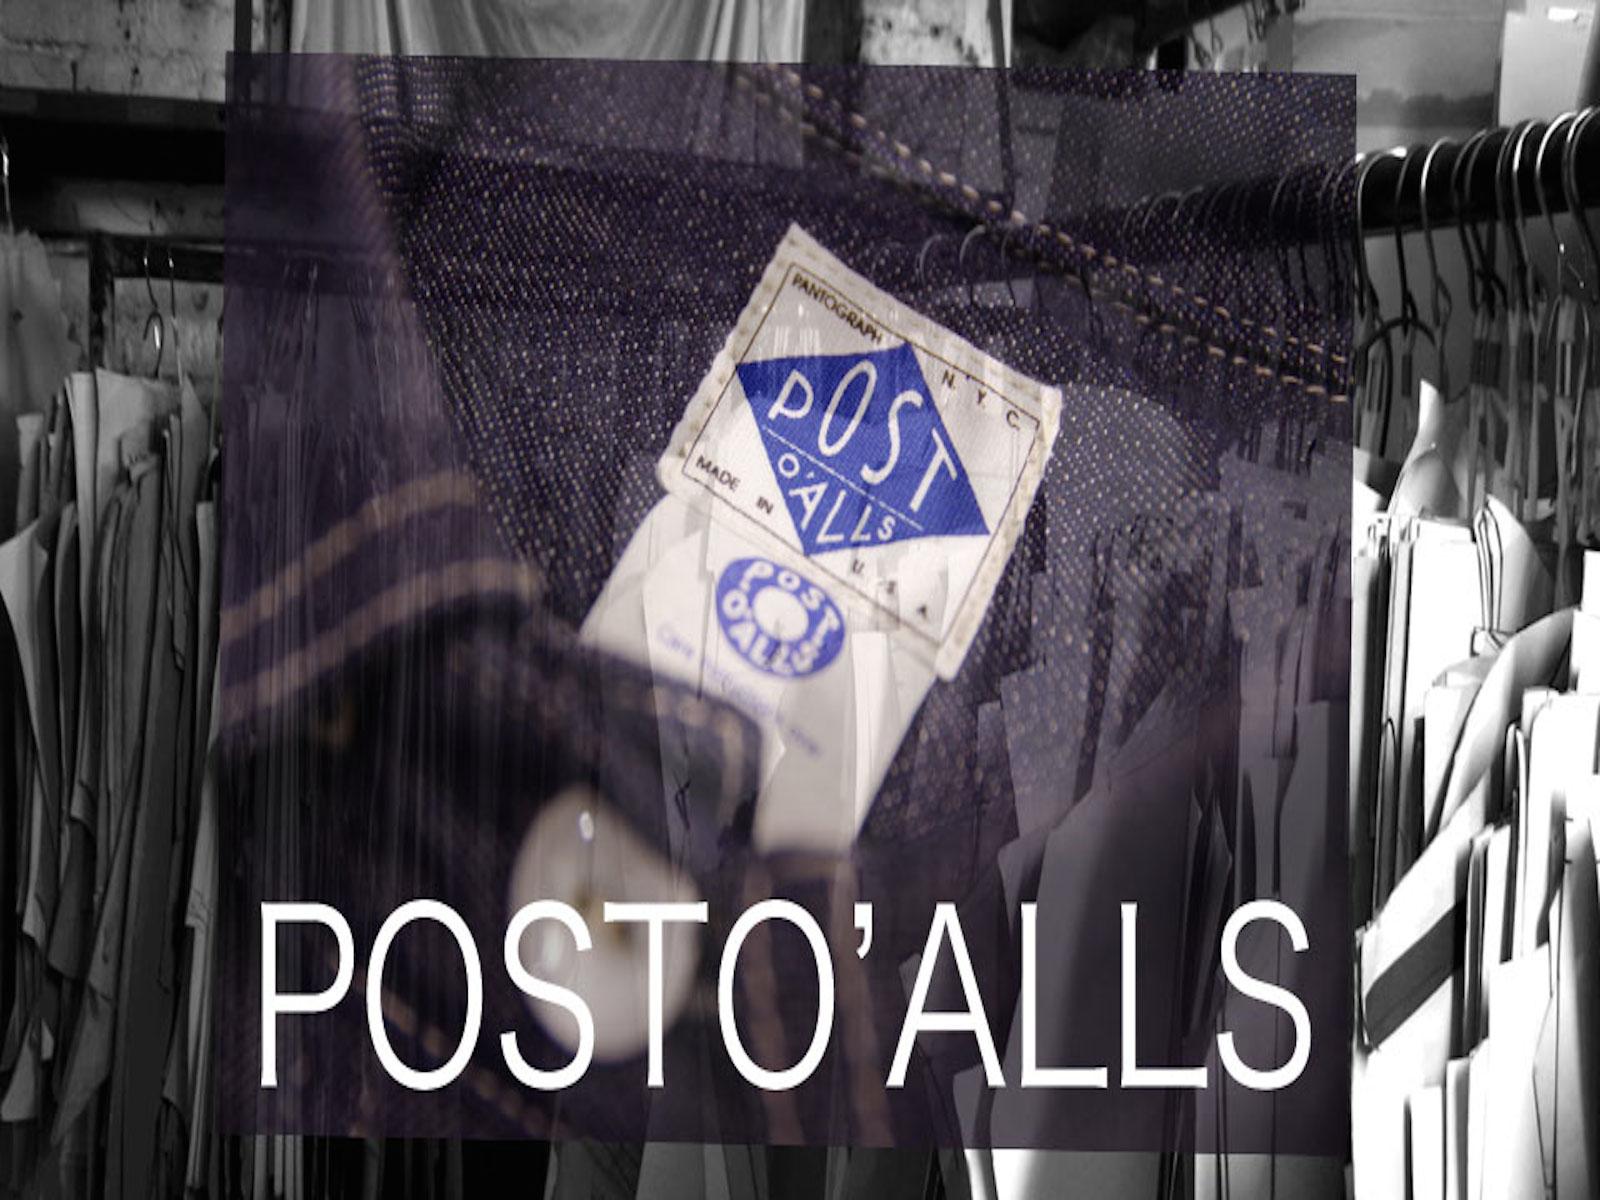 POSTO'ALLS DEADSTOCK SHIRT